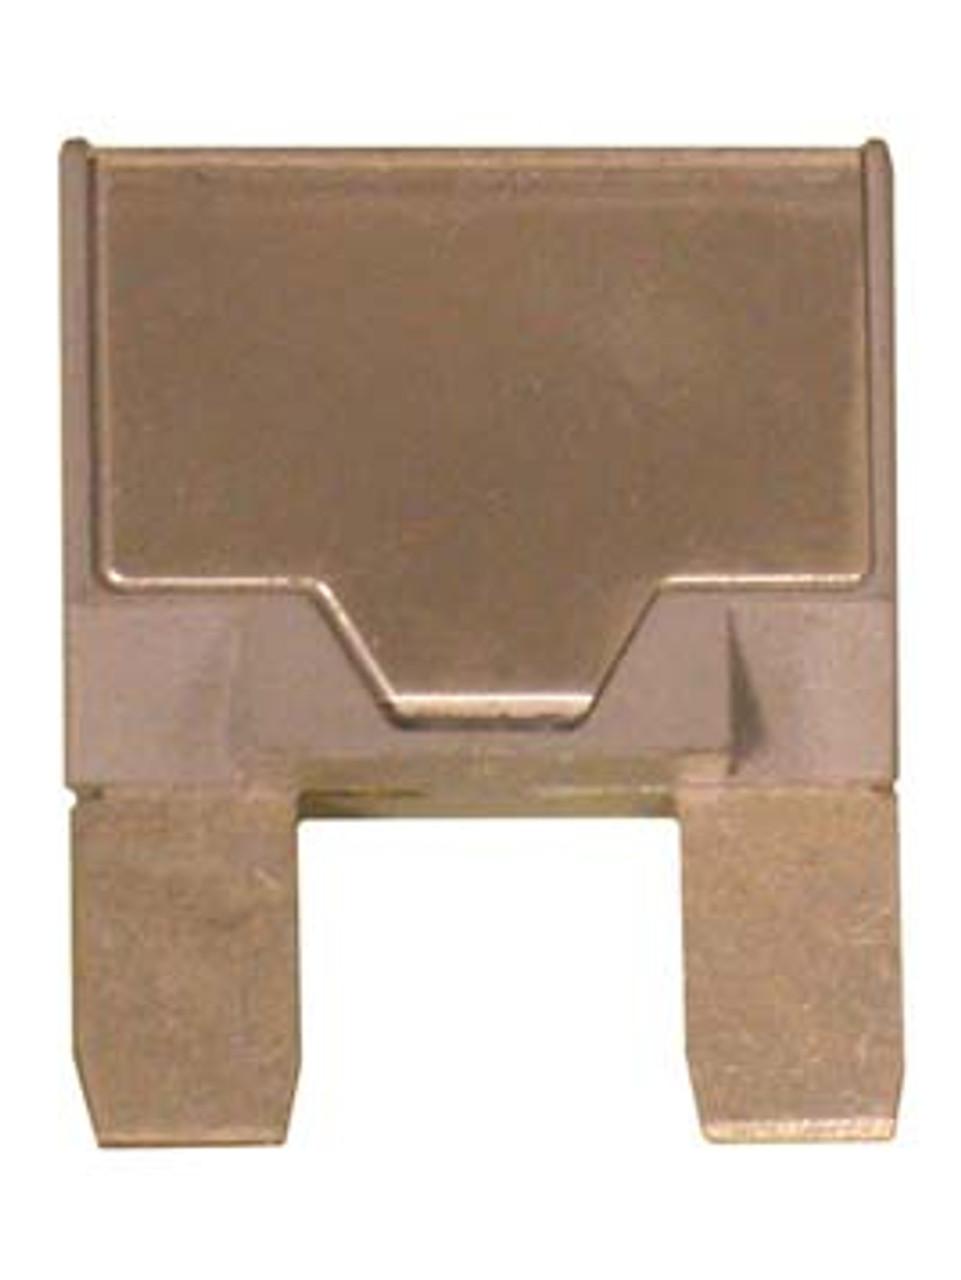 950 --- Maxi Circuit Breakers - 20 amps